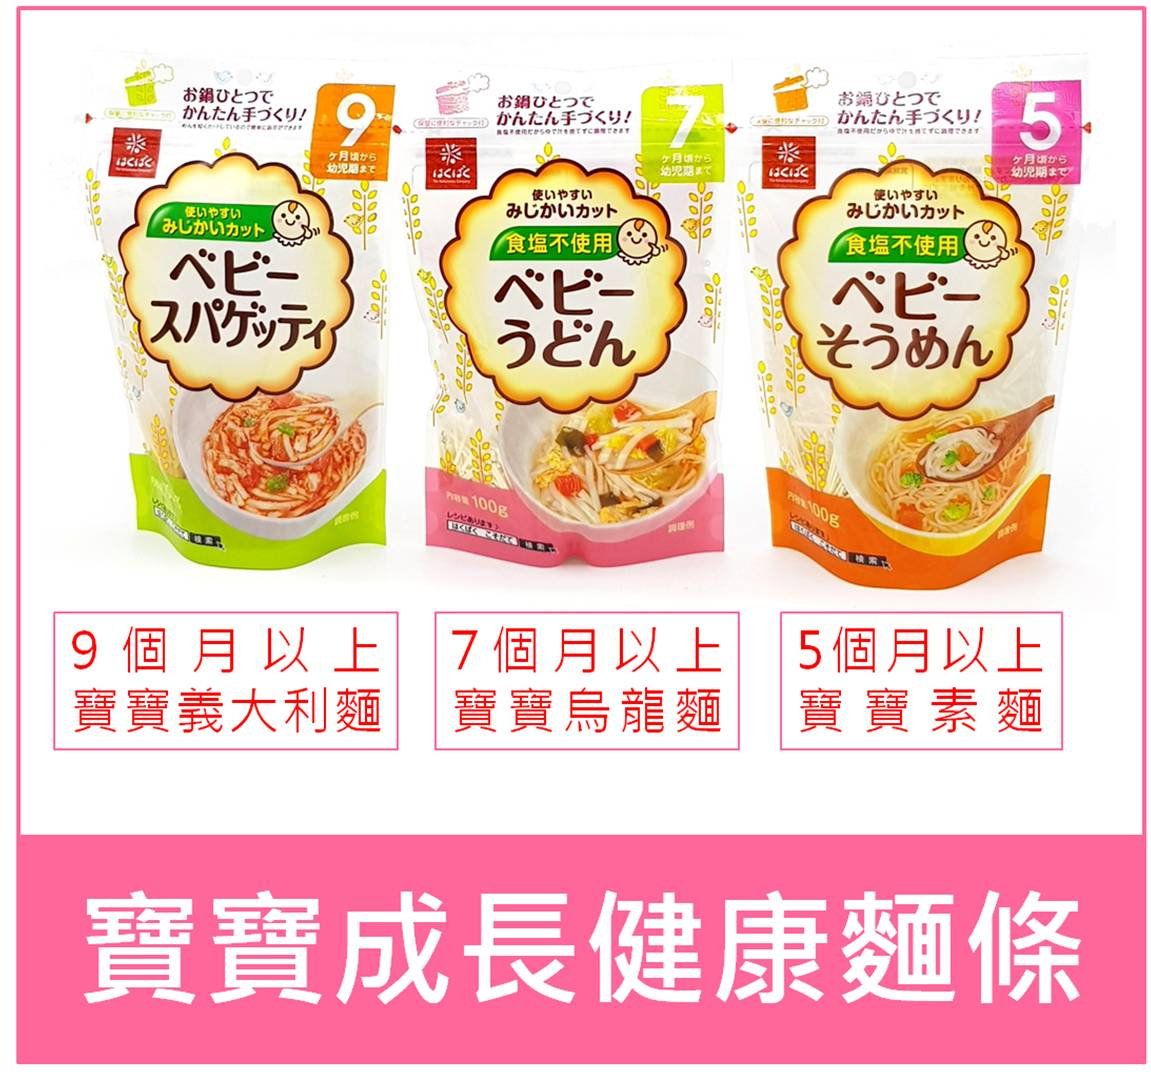 《Chara 微百貨》日本 hakubaku 田靡 寶寶 麵條 素麵 烏龍麵 100g 副食品 義大利麵 嬰兒 2